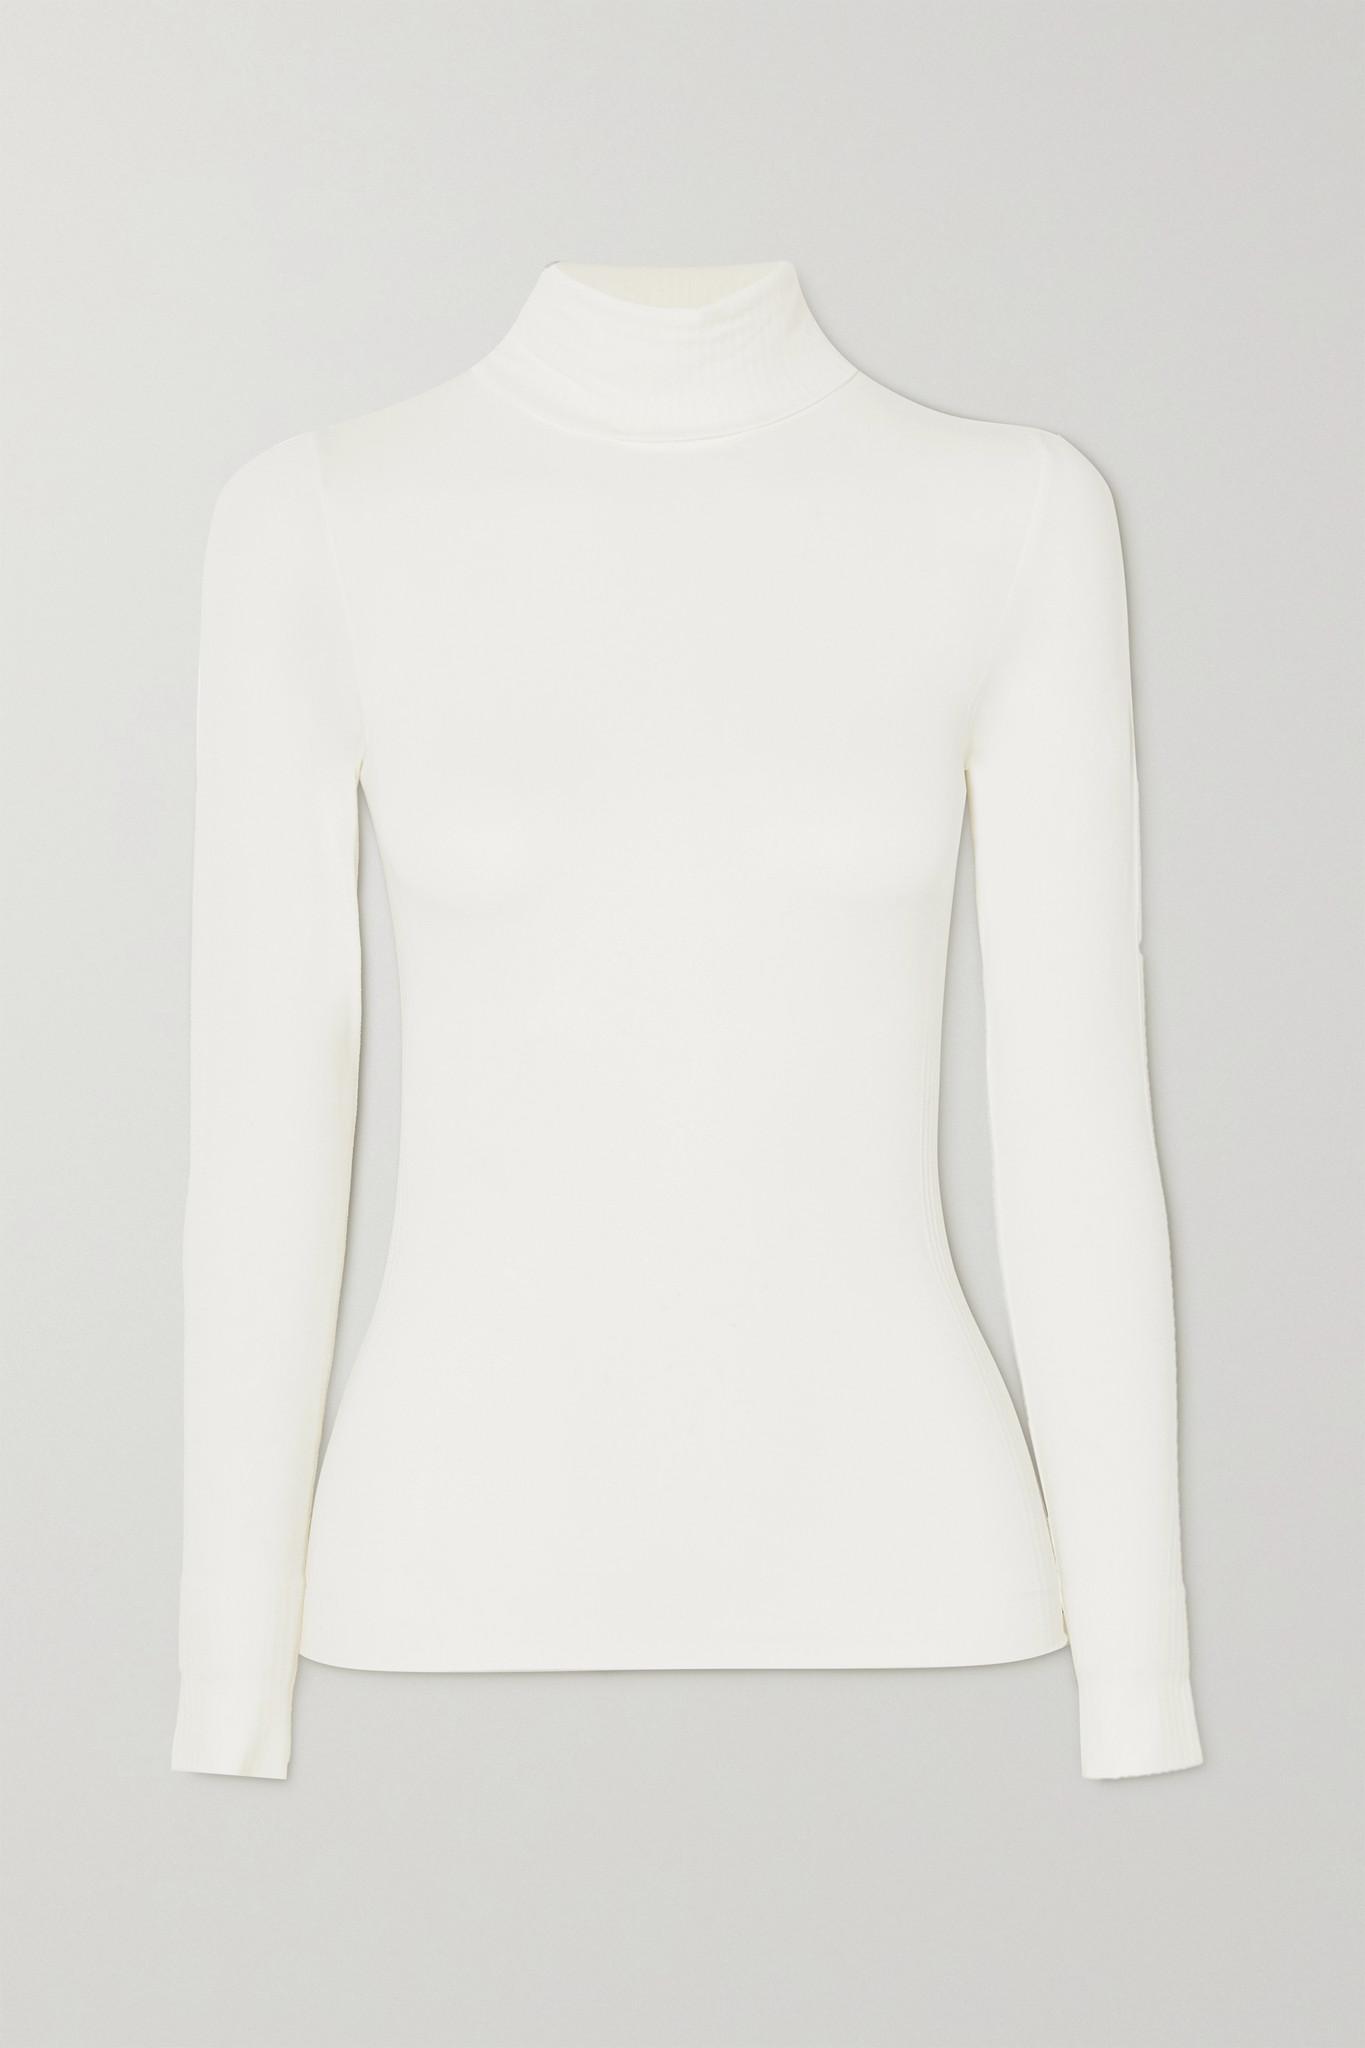 FUSALP - Alisier Ii 莫代尔混纺高领上衣 - 白色 - M/L